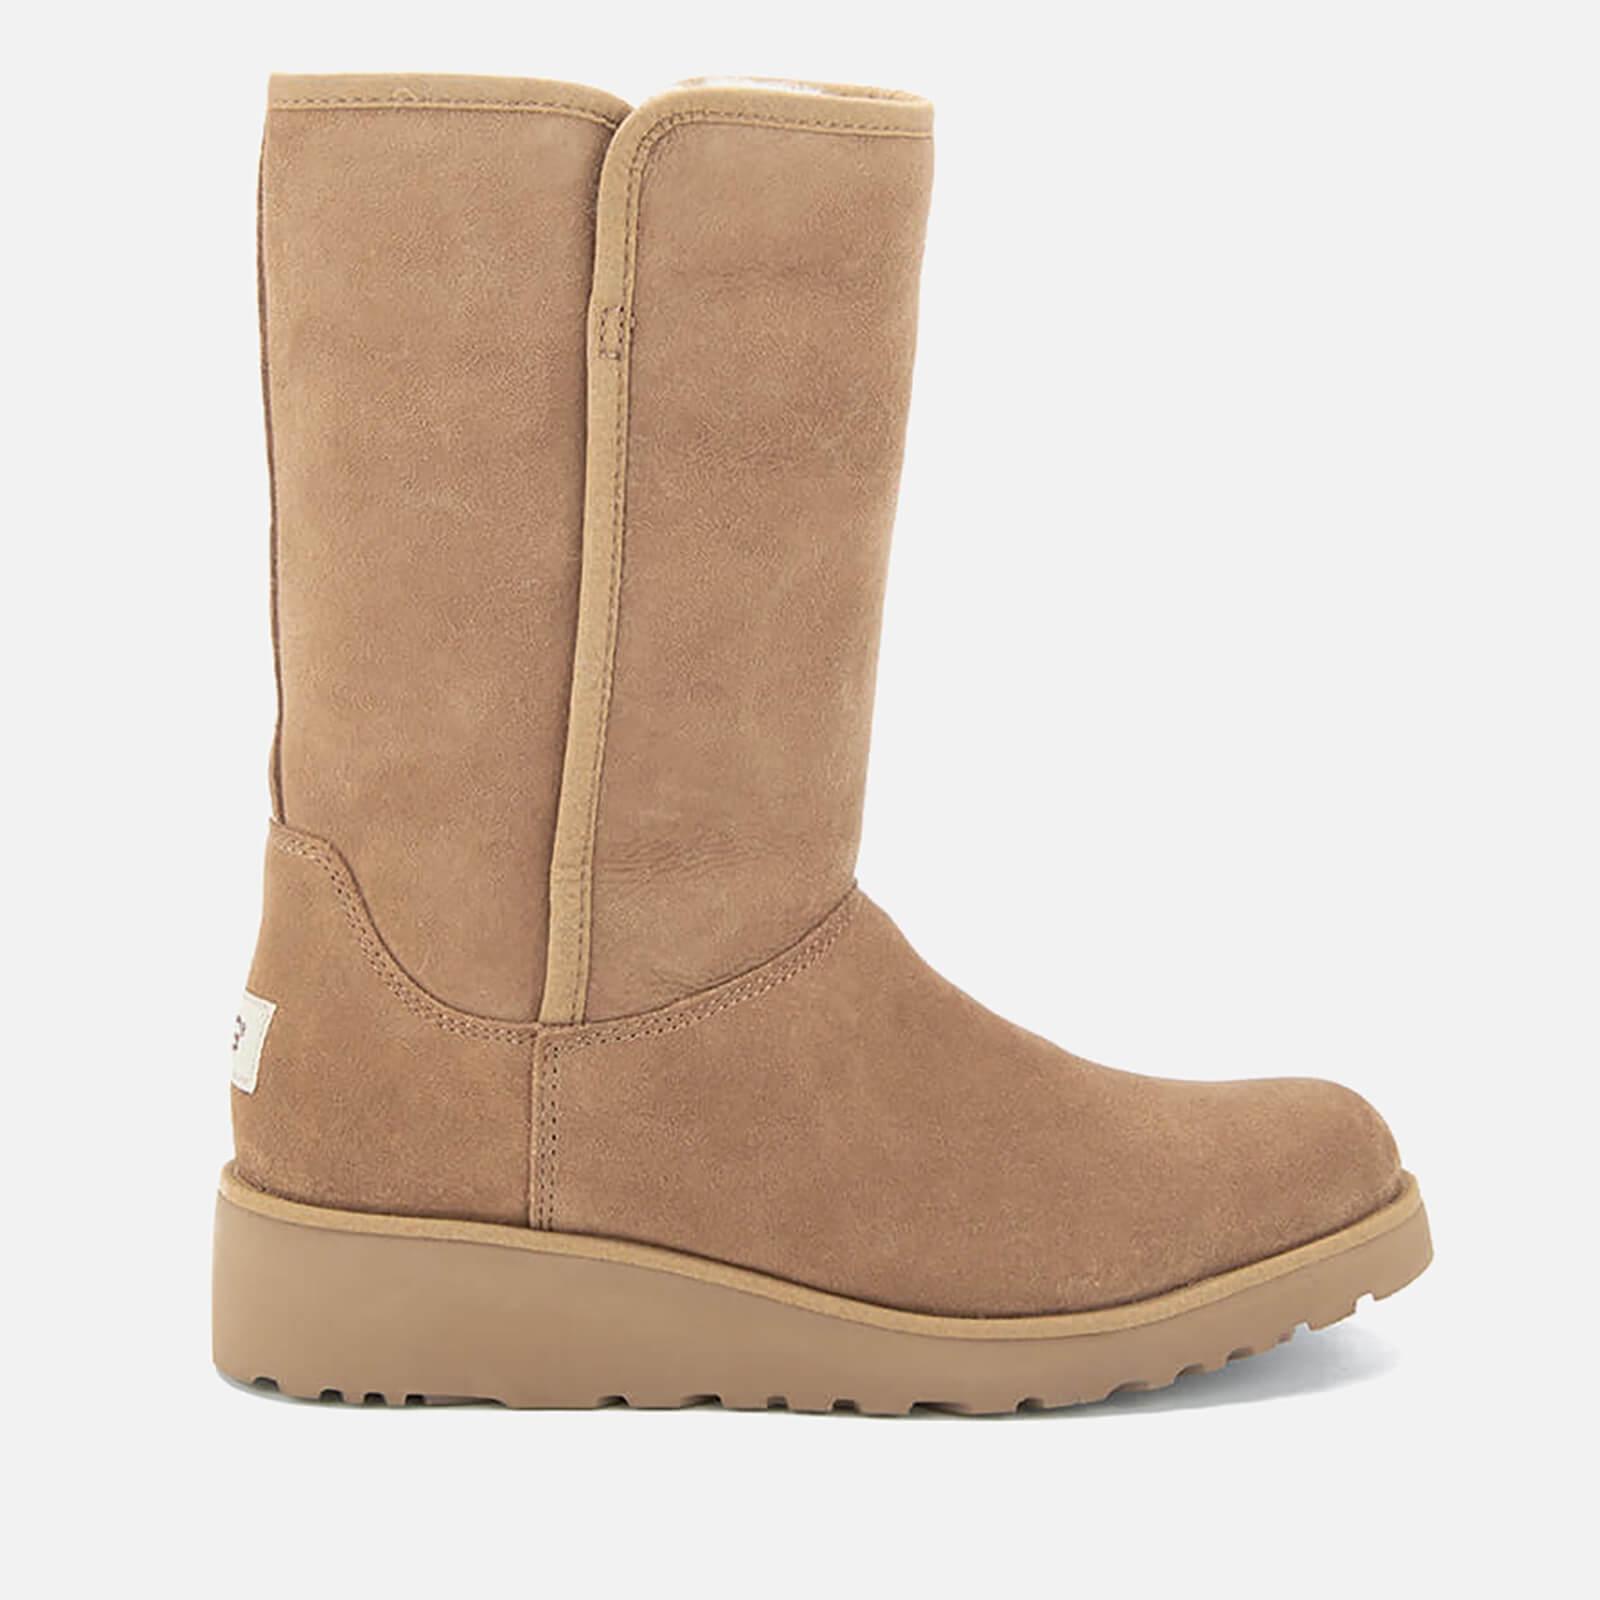 UGG Women s Amie Classic Slim Sheepskin Boots - Chestnut  be05639bde